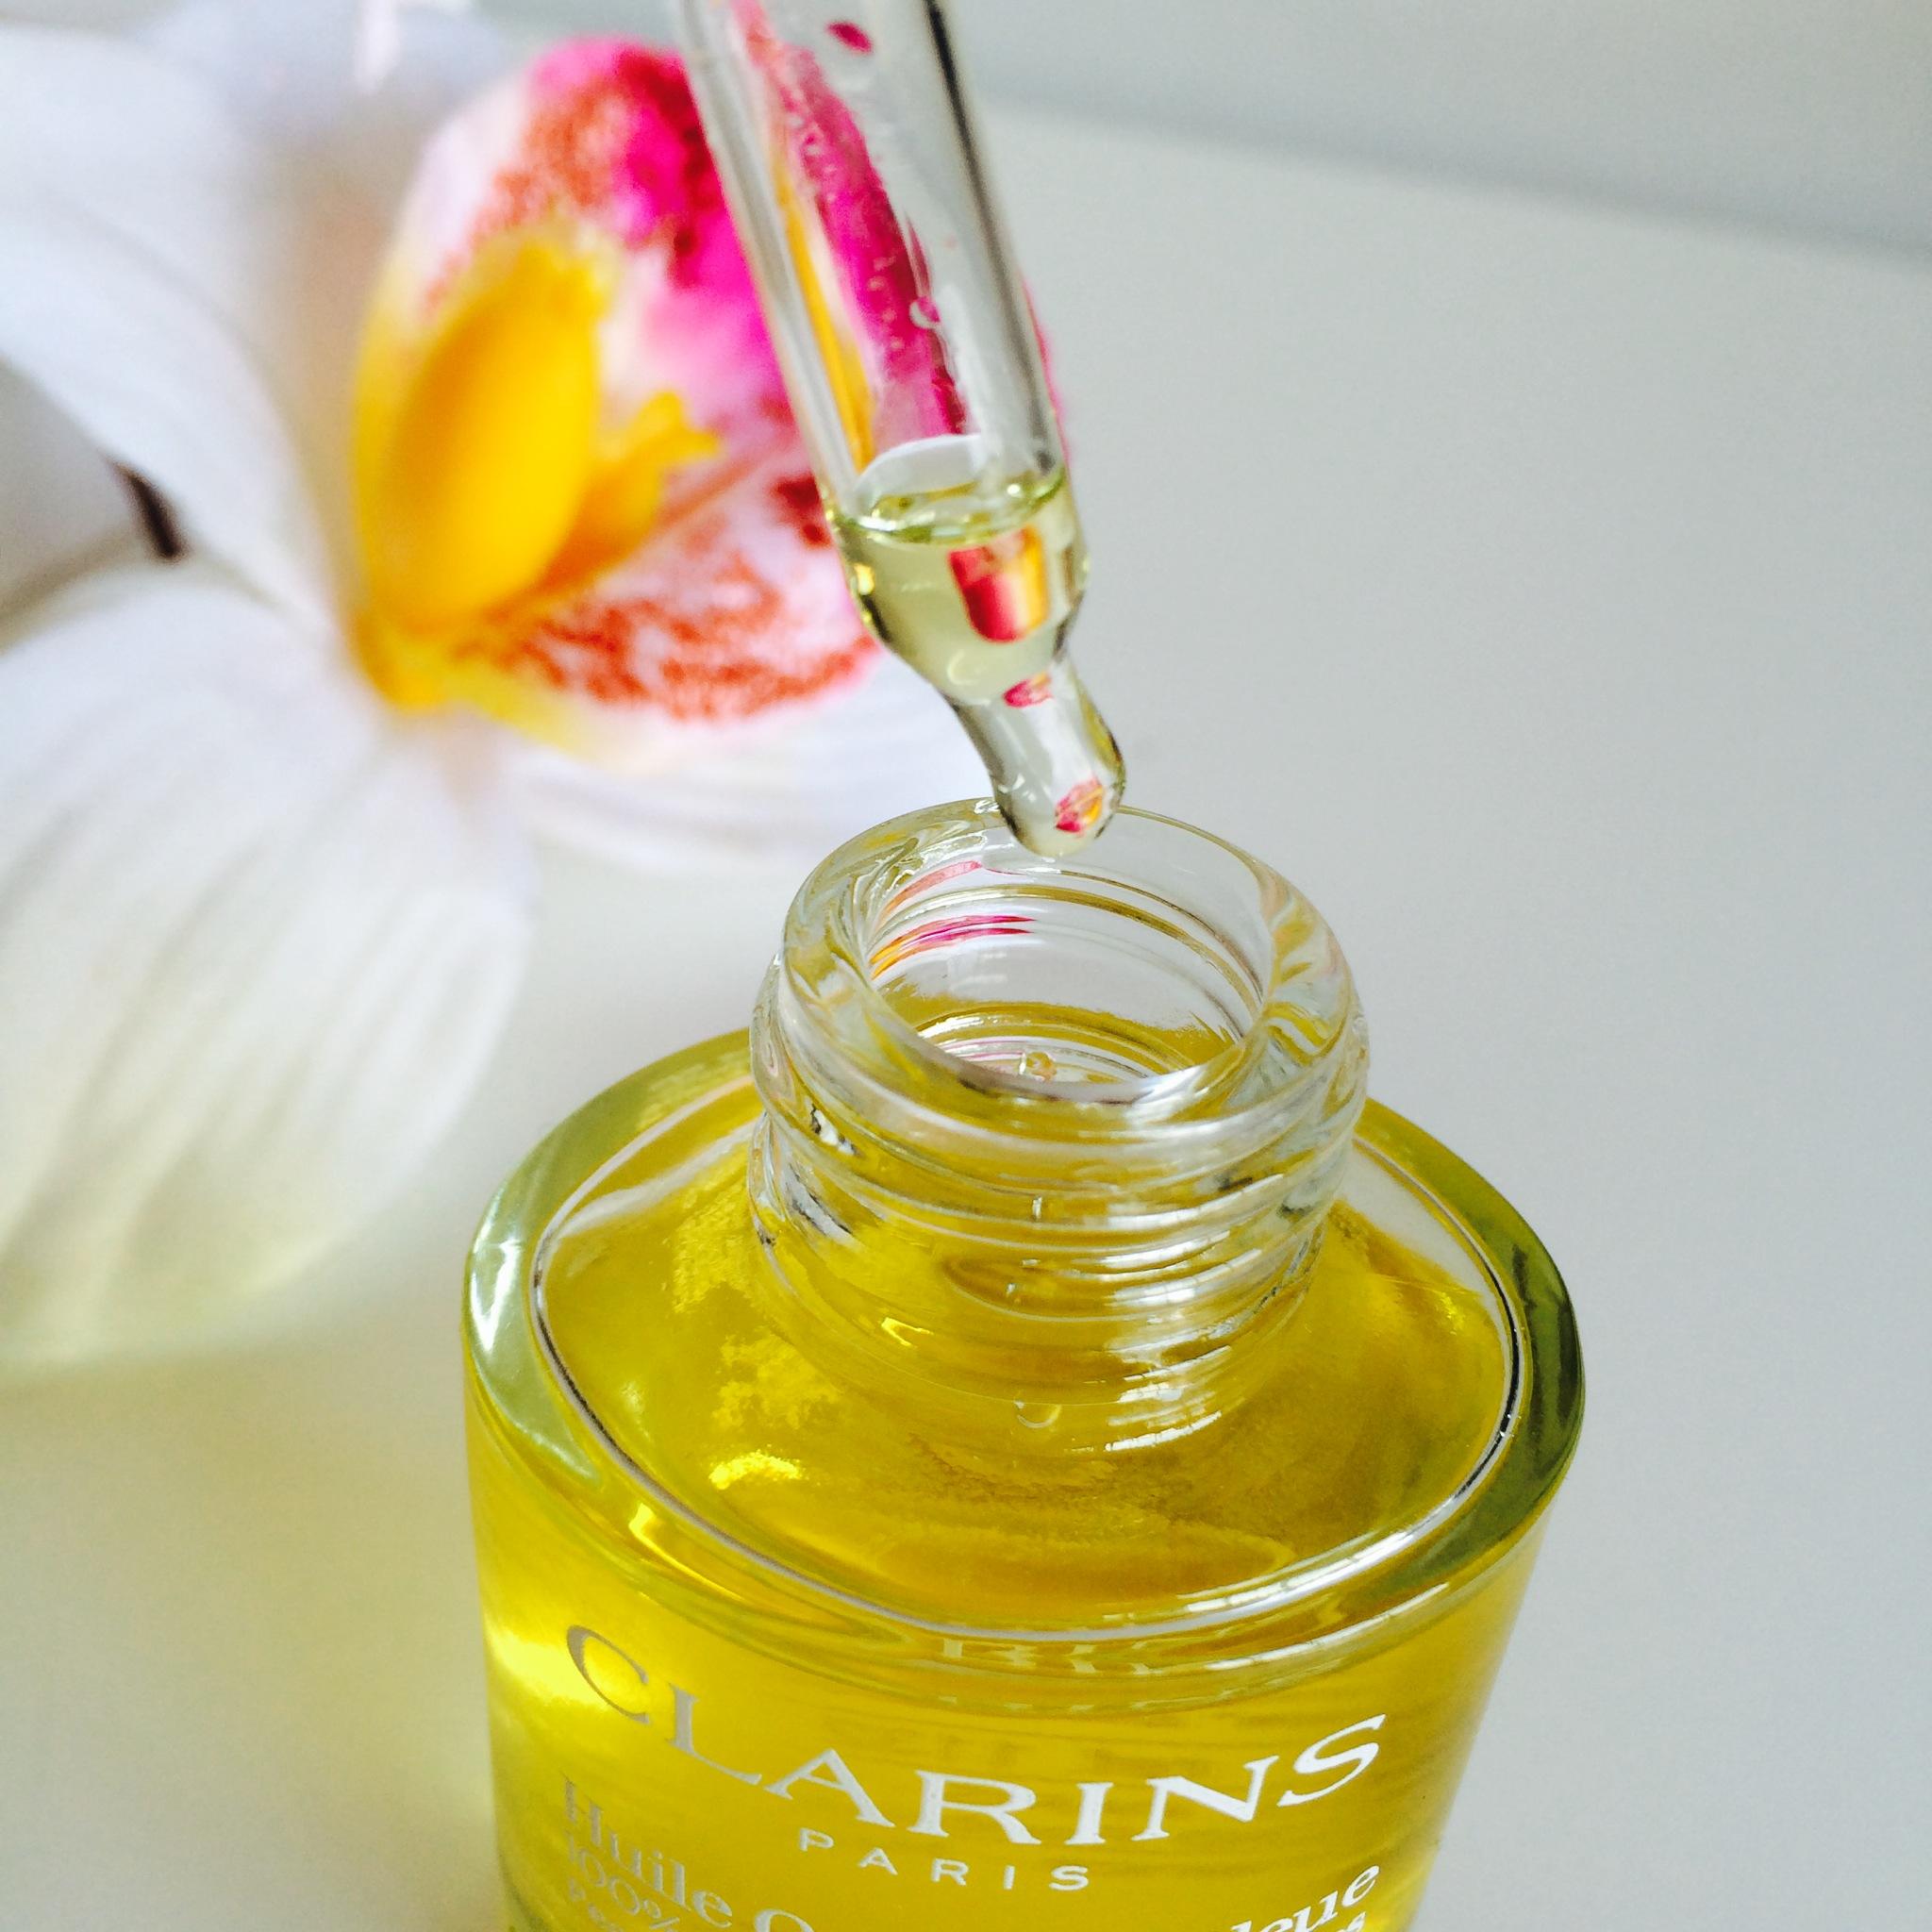 huile orchidée clarins -review